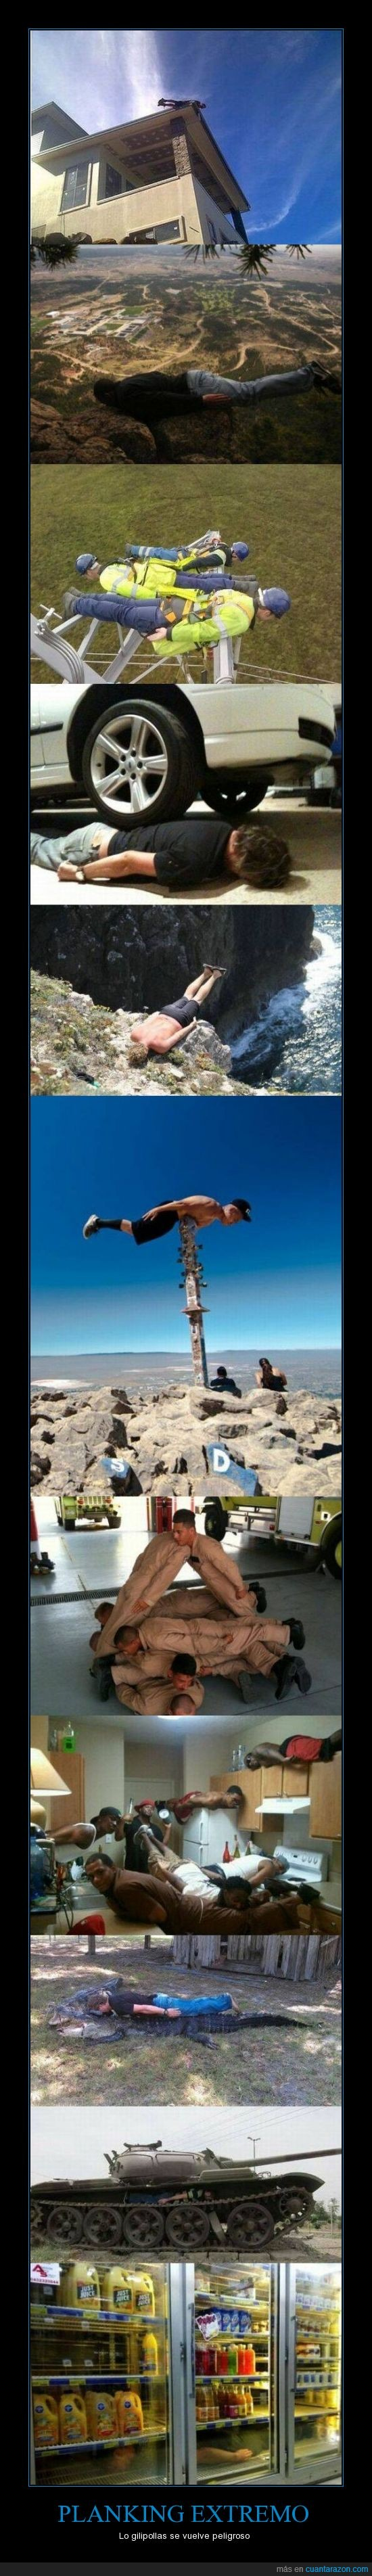 extremo,peligroso,planking,tabla,X Games